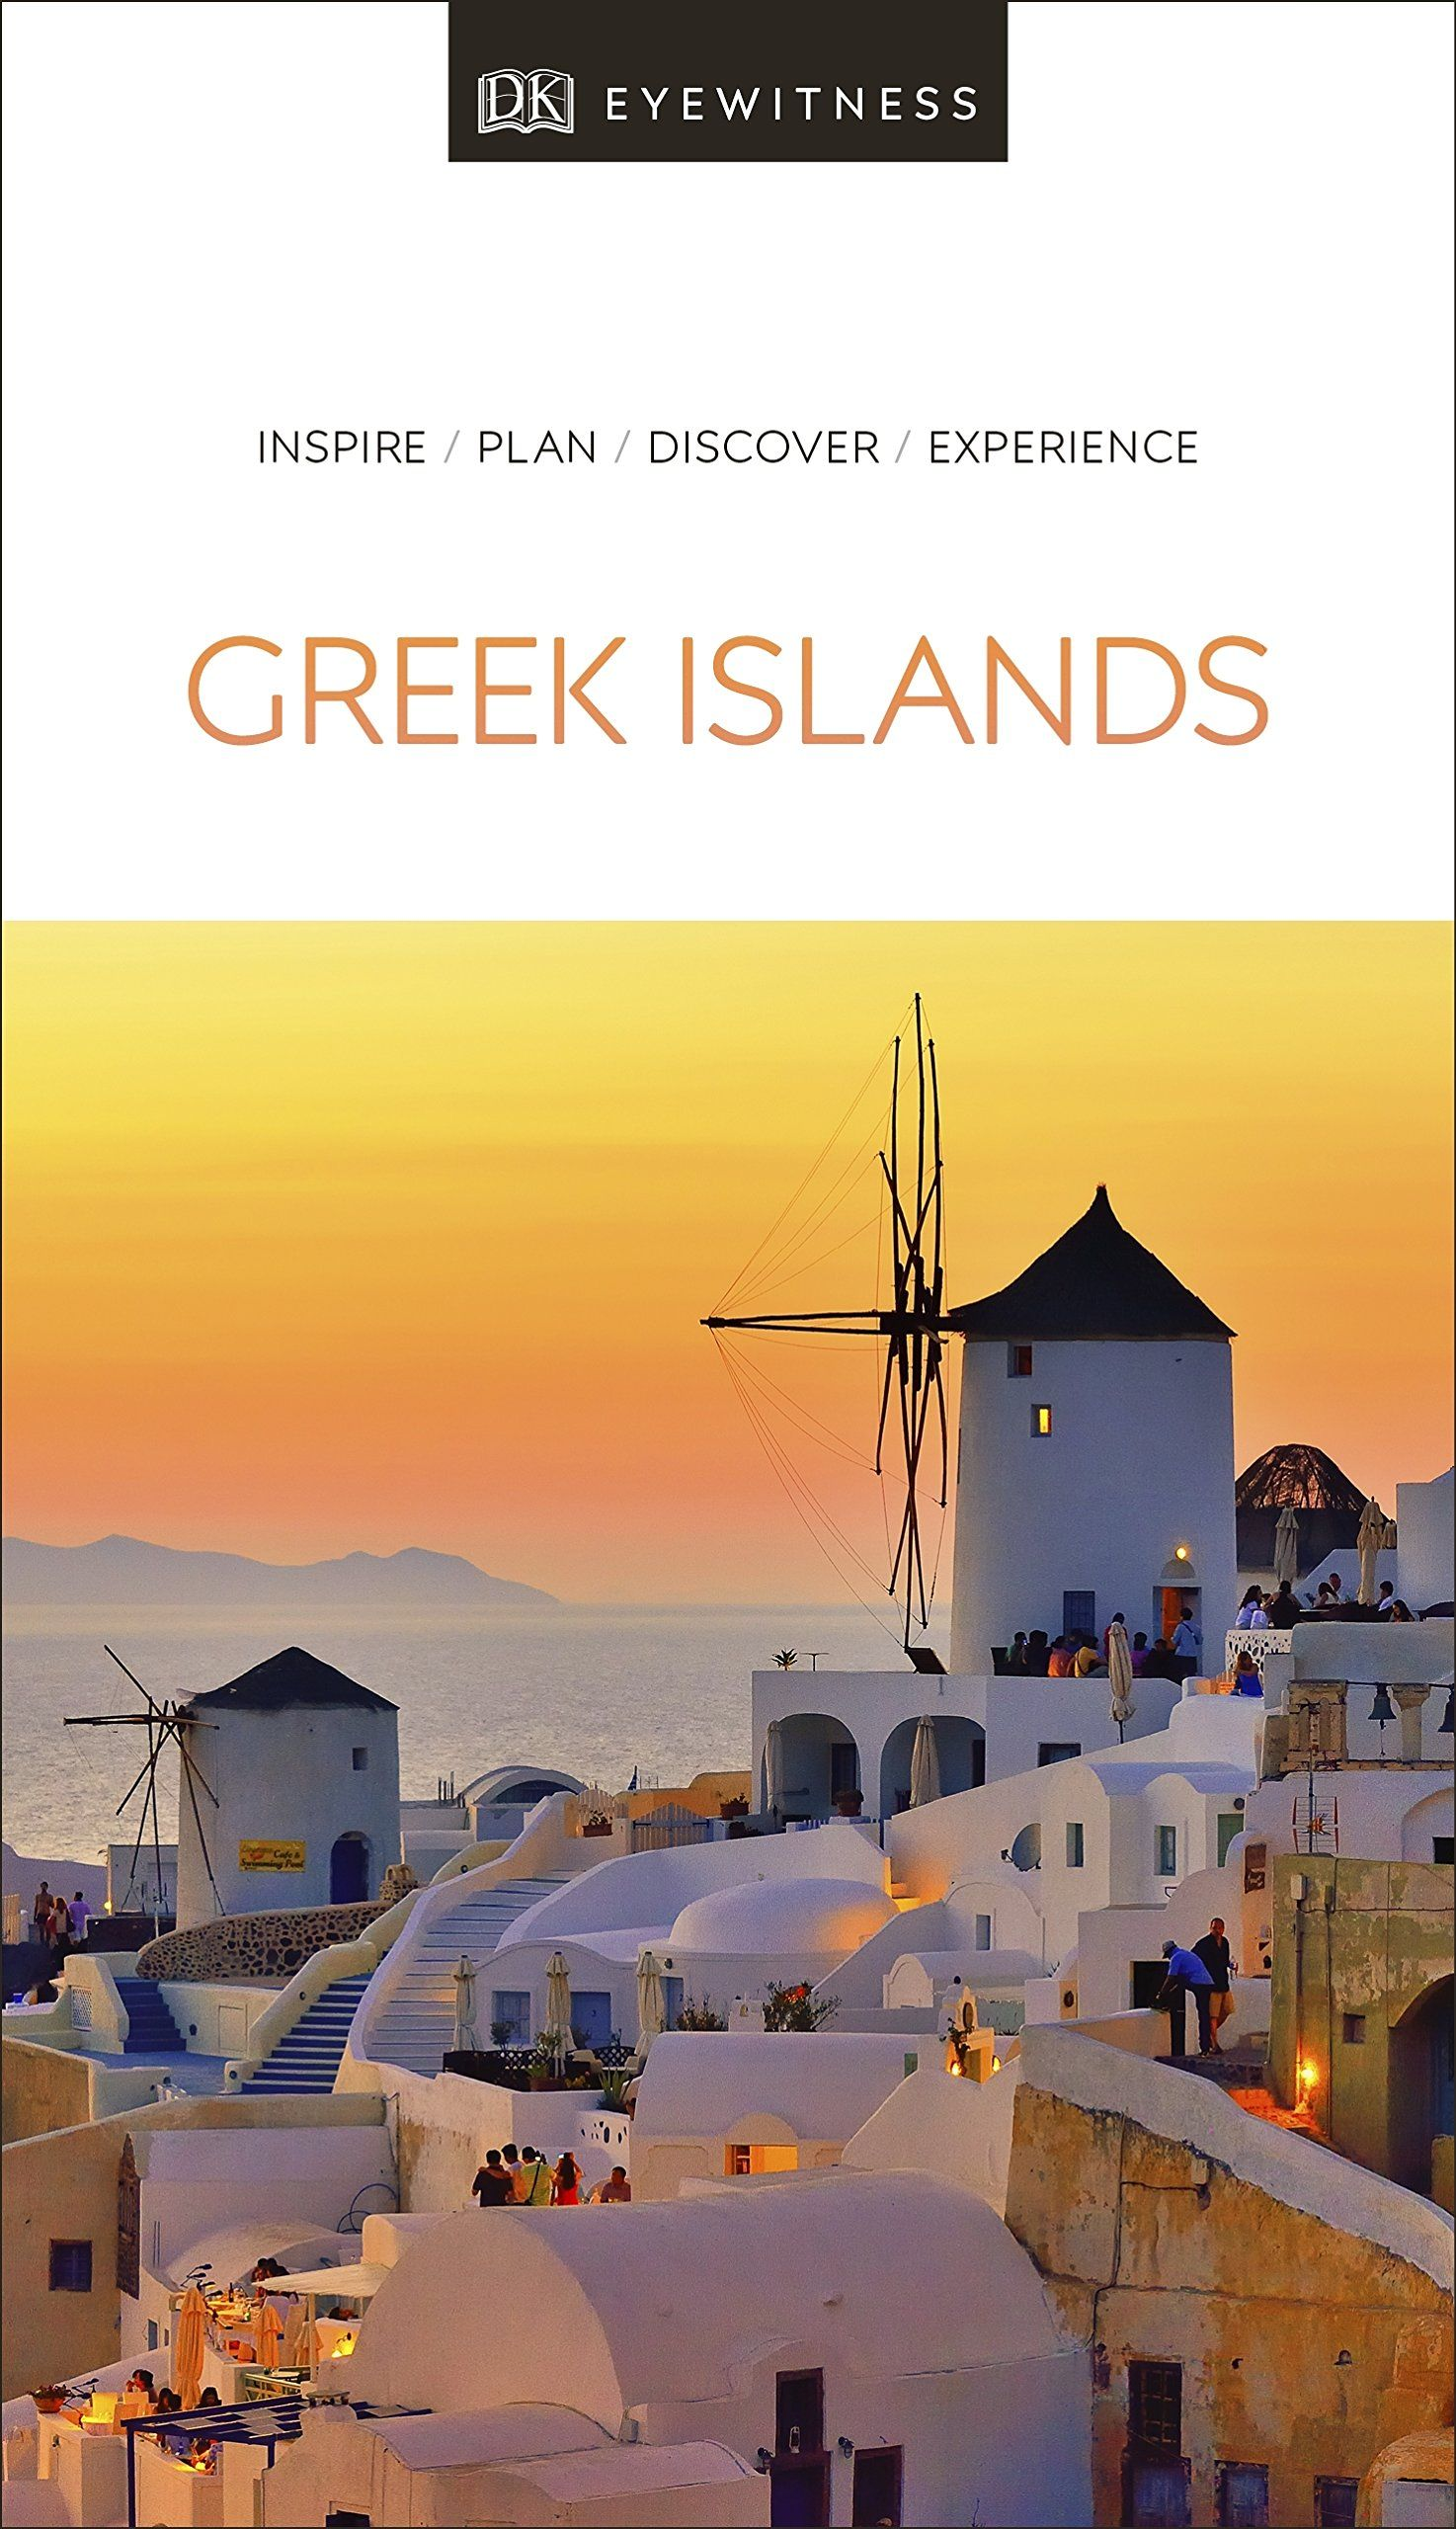 DK Eyewitness Travel Guide The Greek Islands Paperback – February 7 ... b91c4c022e5